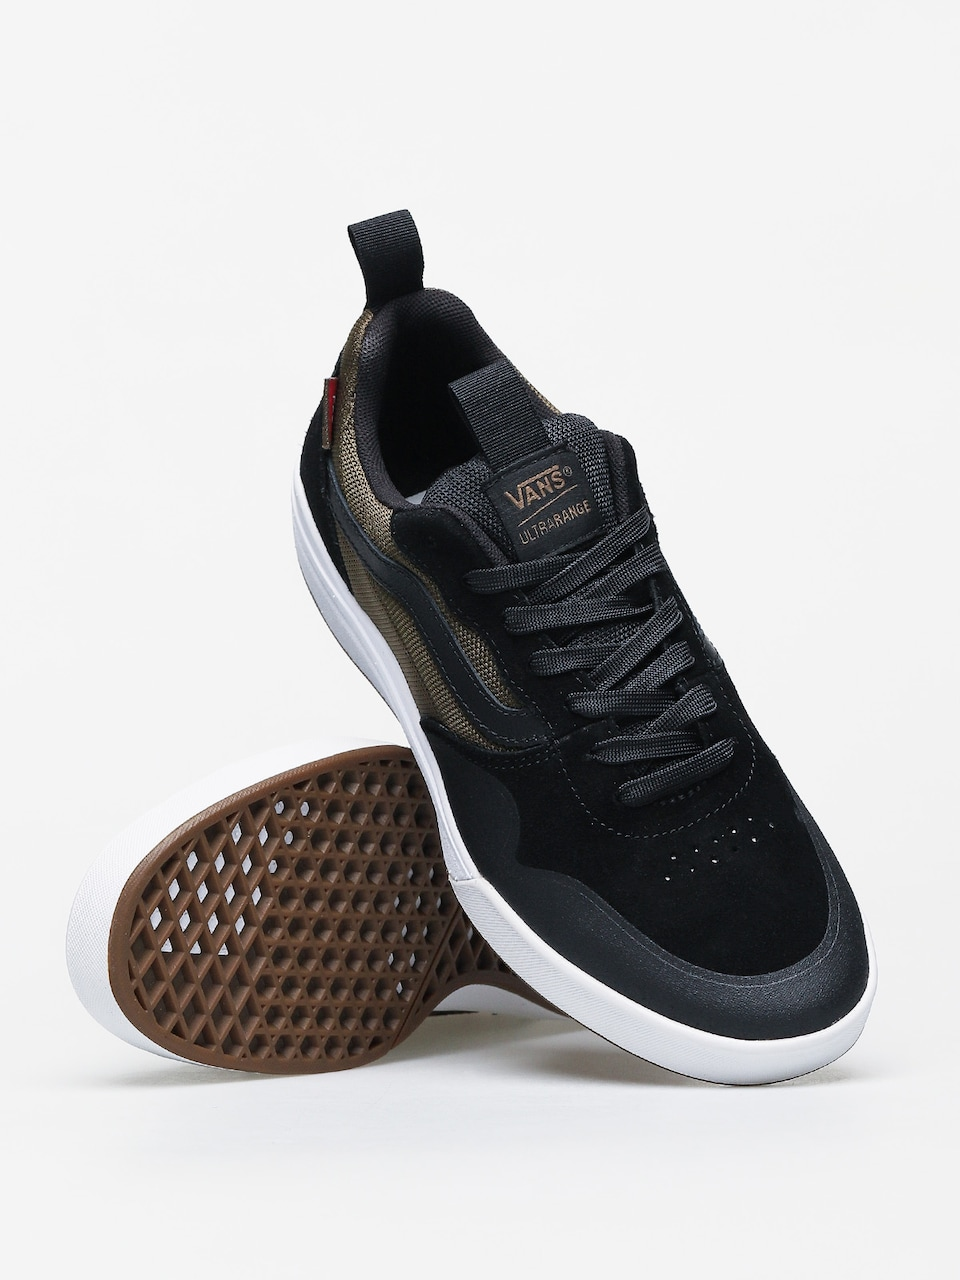 Vans Ultrarange Pro 2 Shoes (tactical